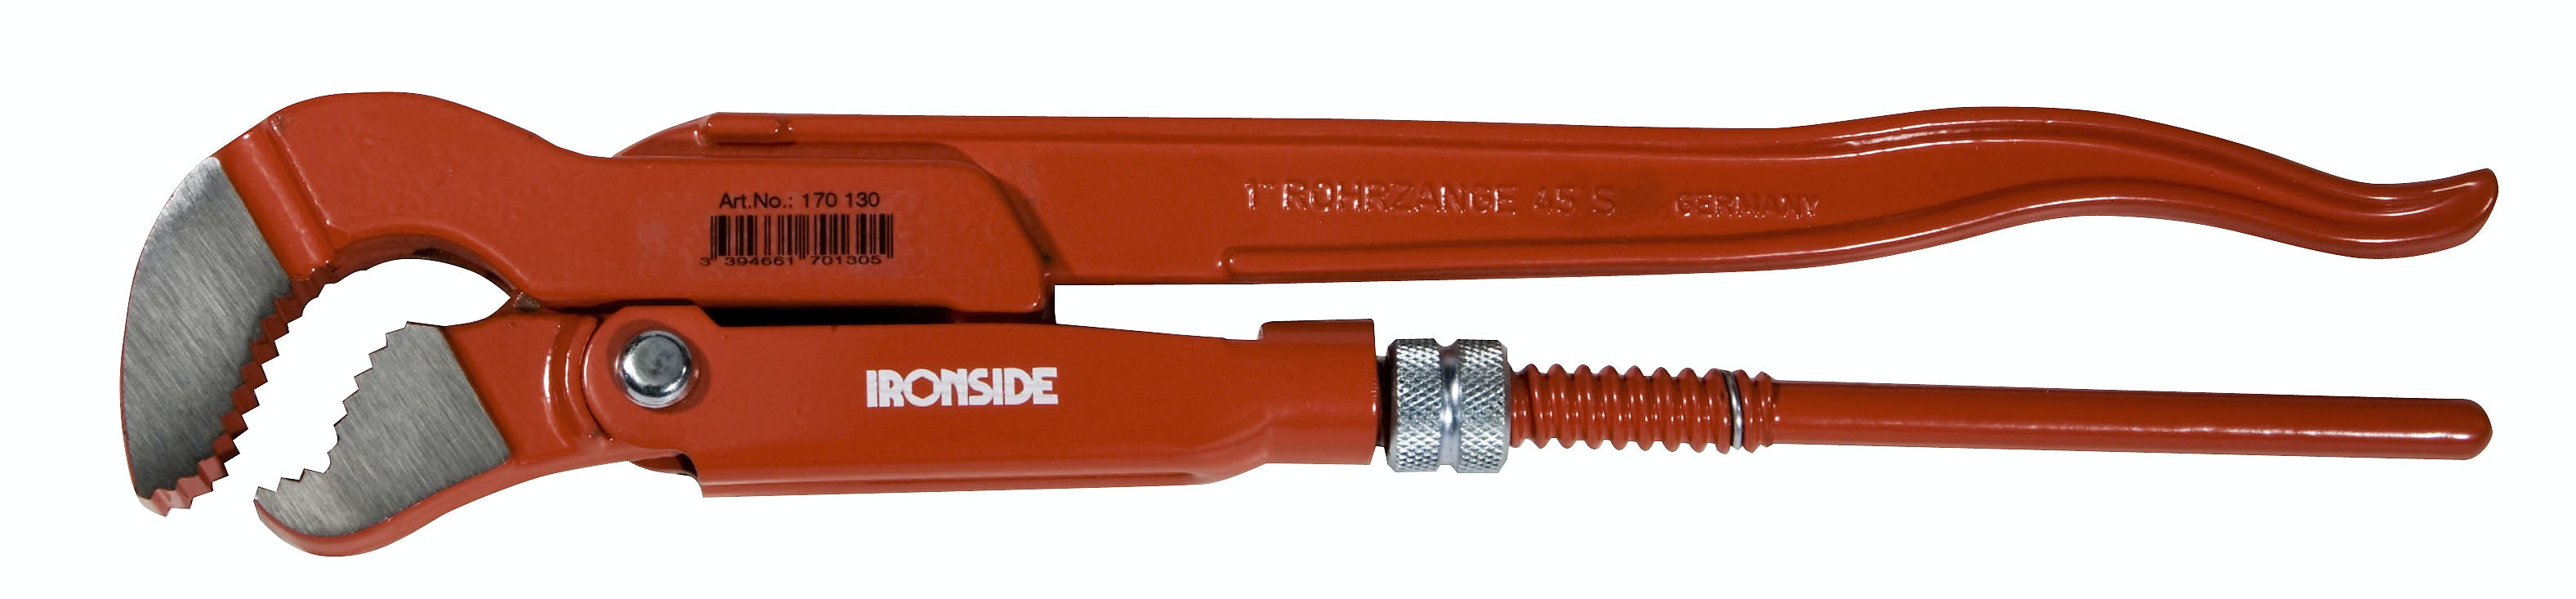 Rörtång Ironside 90° 2IN